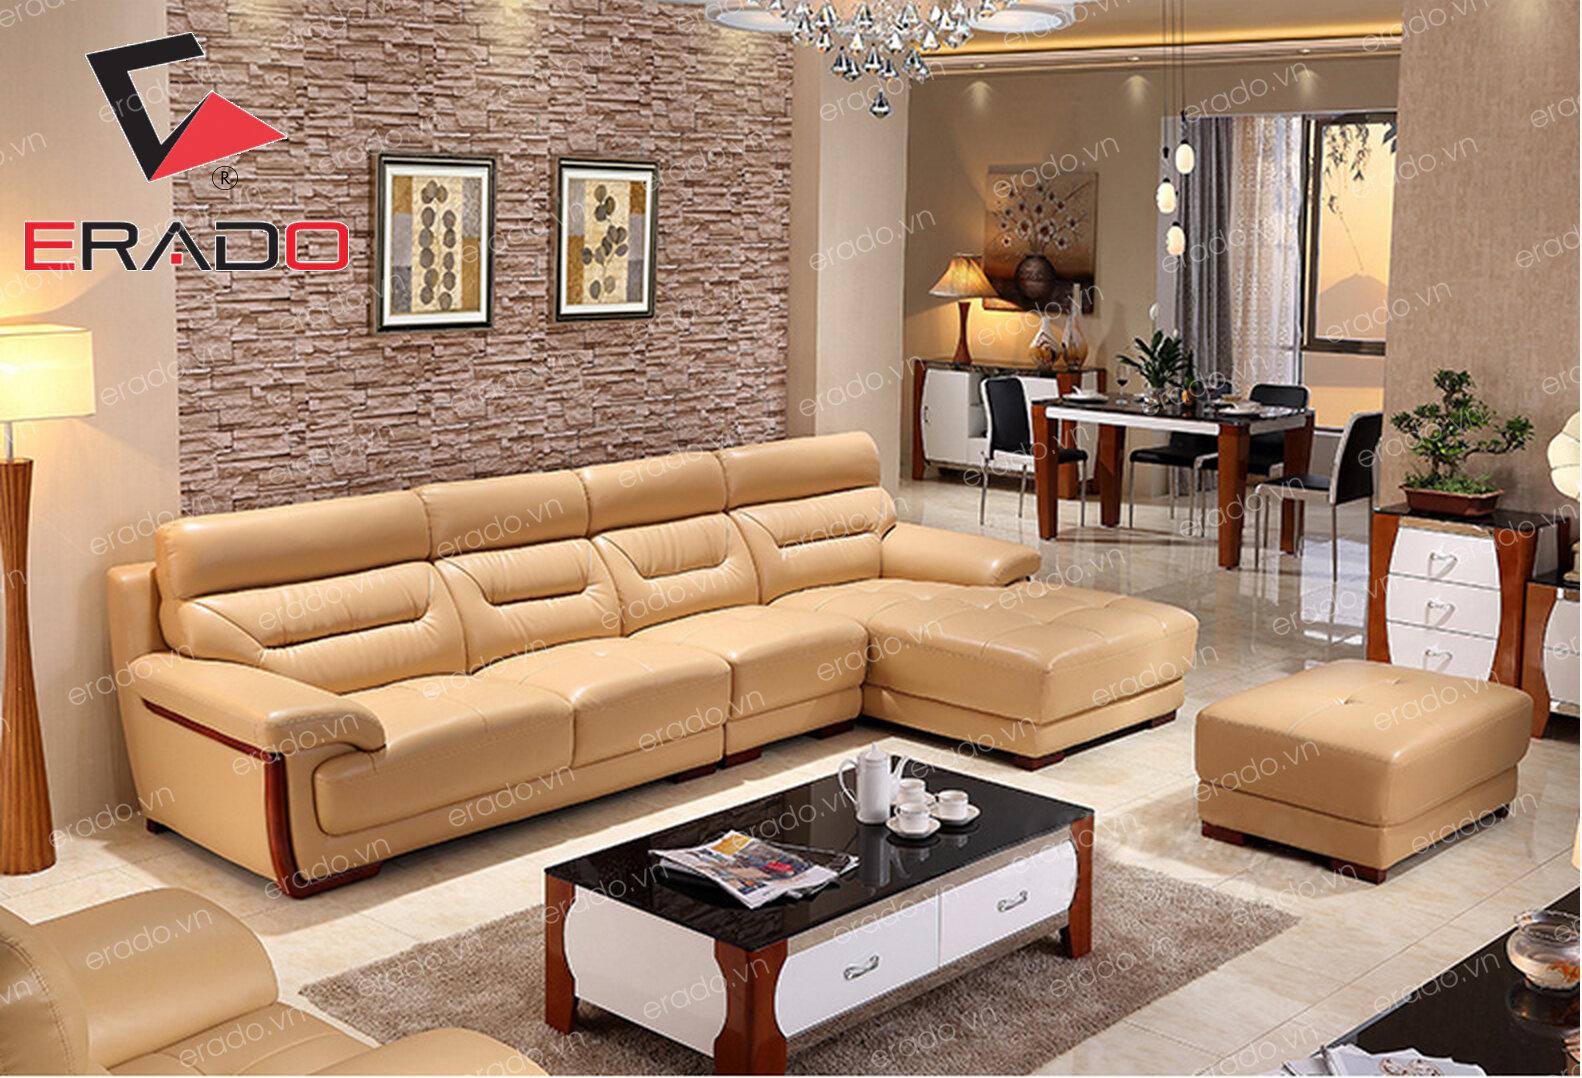 Sofa da mã 392